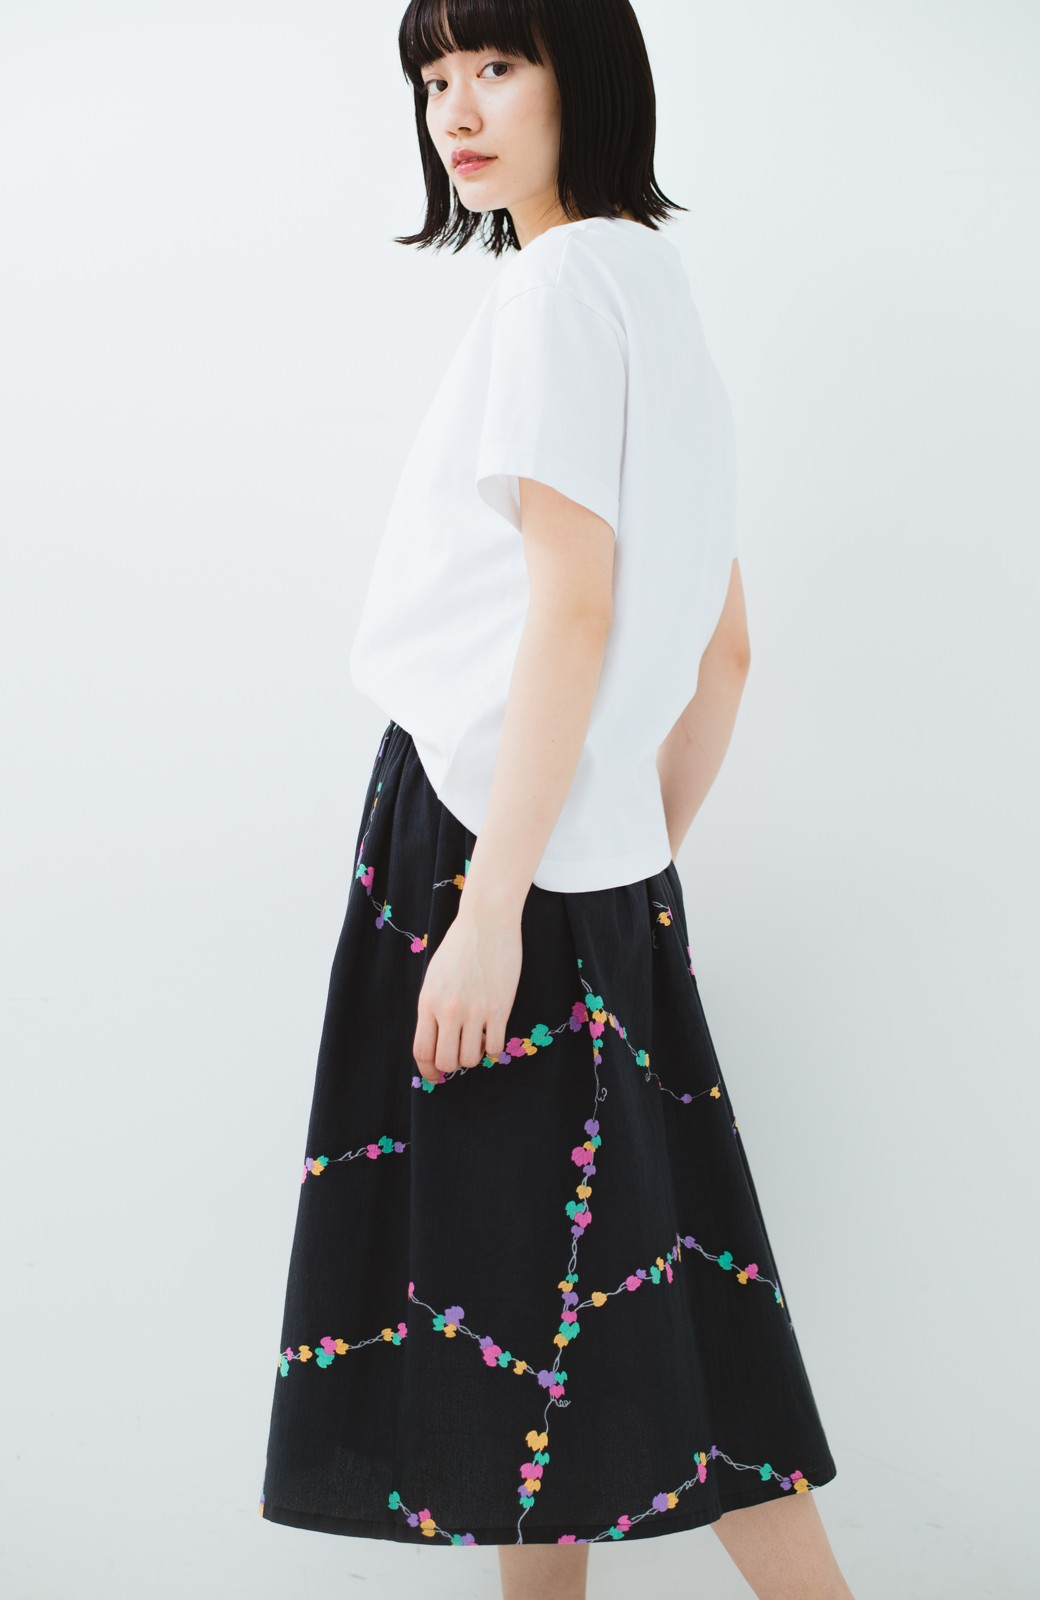 haco! 京都の浴衣屋さんと作った浴衣生地のスカート <ブラック系その他>の商品写真18